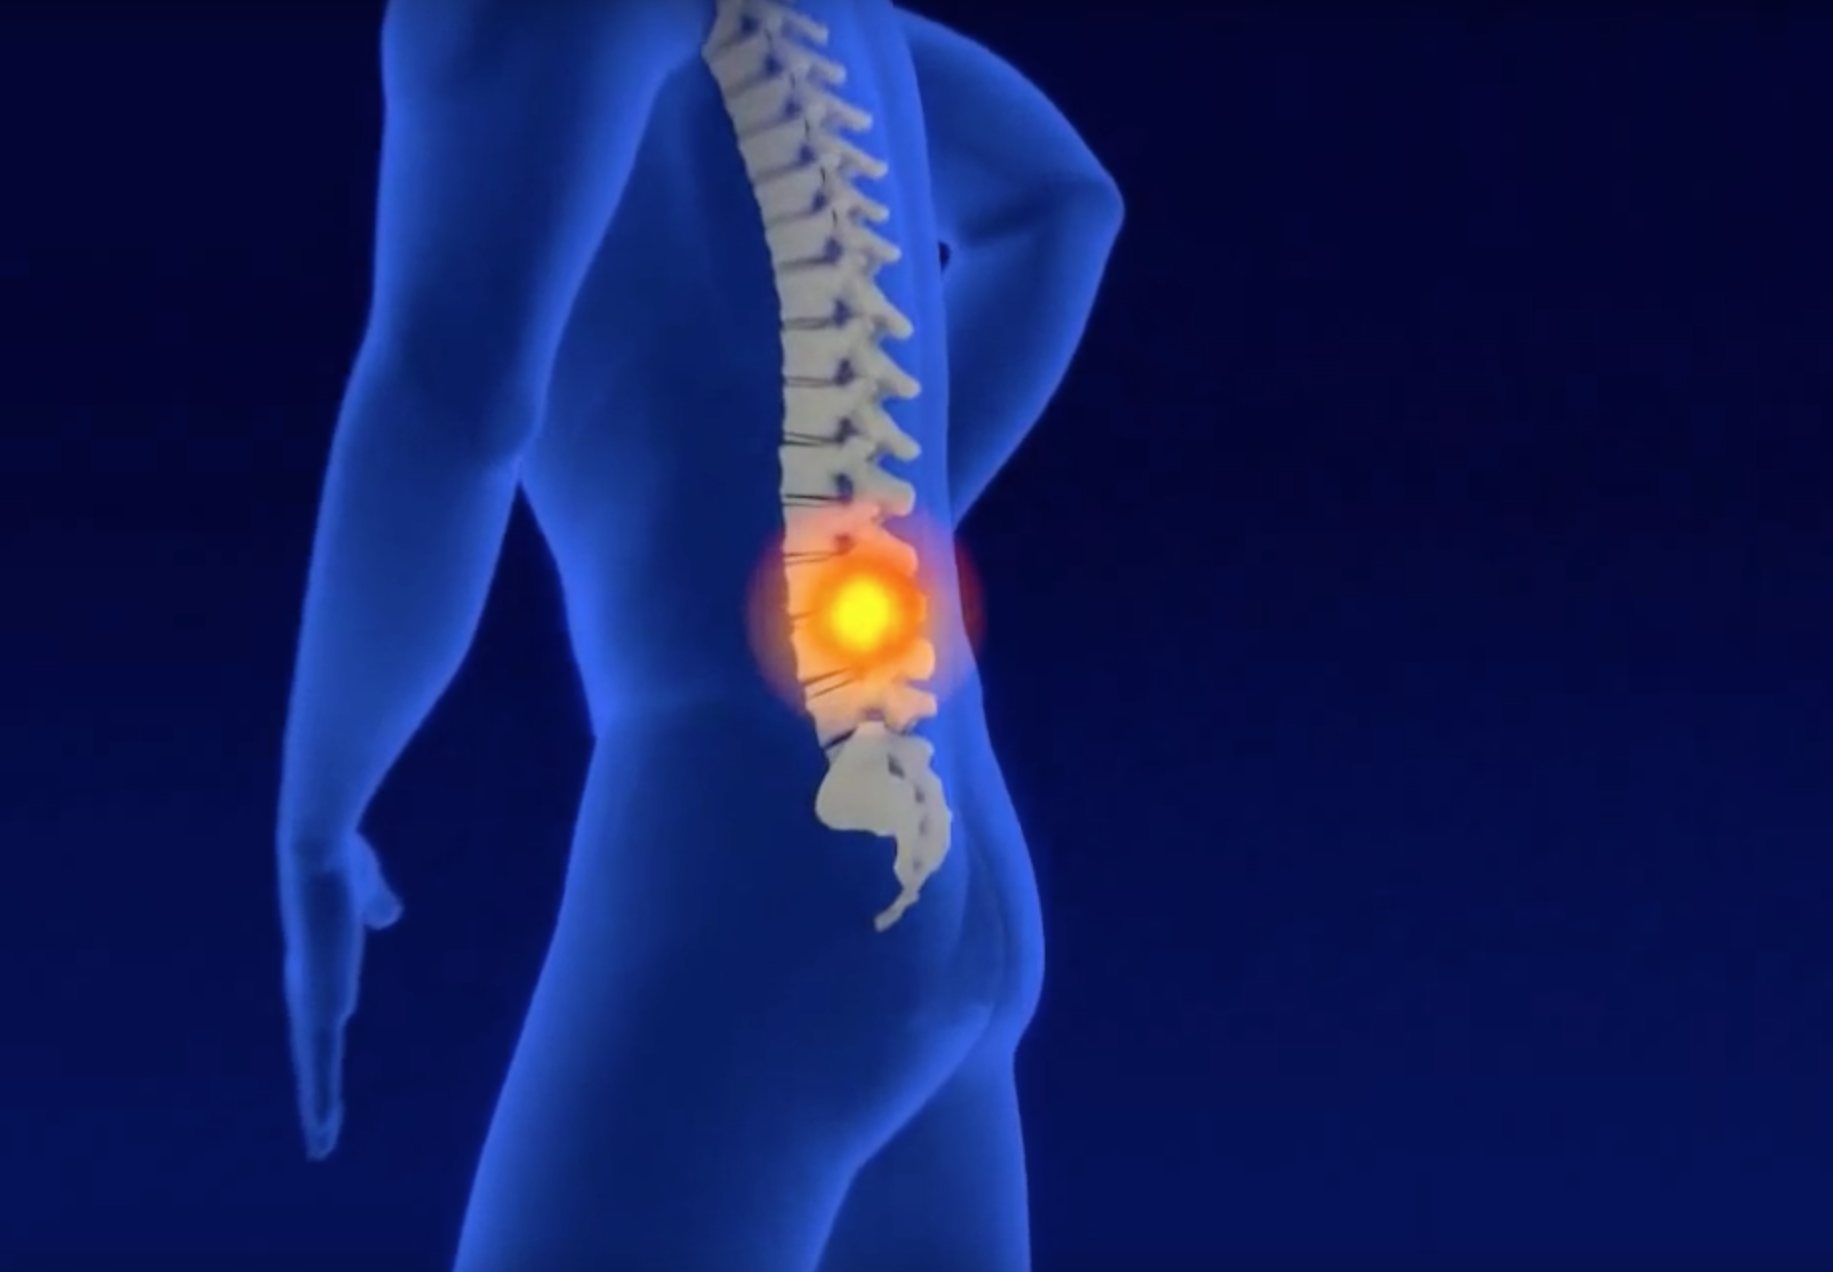 biomag canarias -magneto terapia